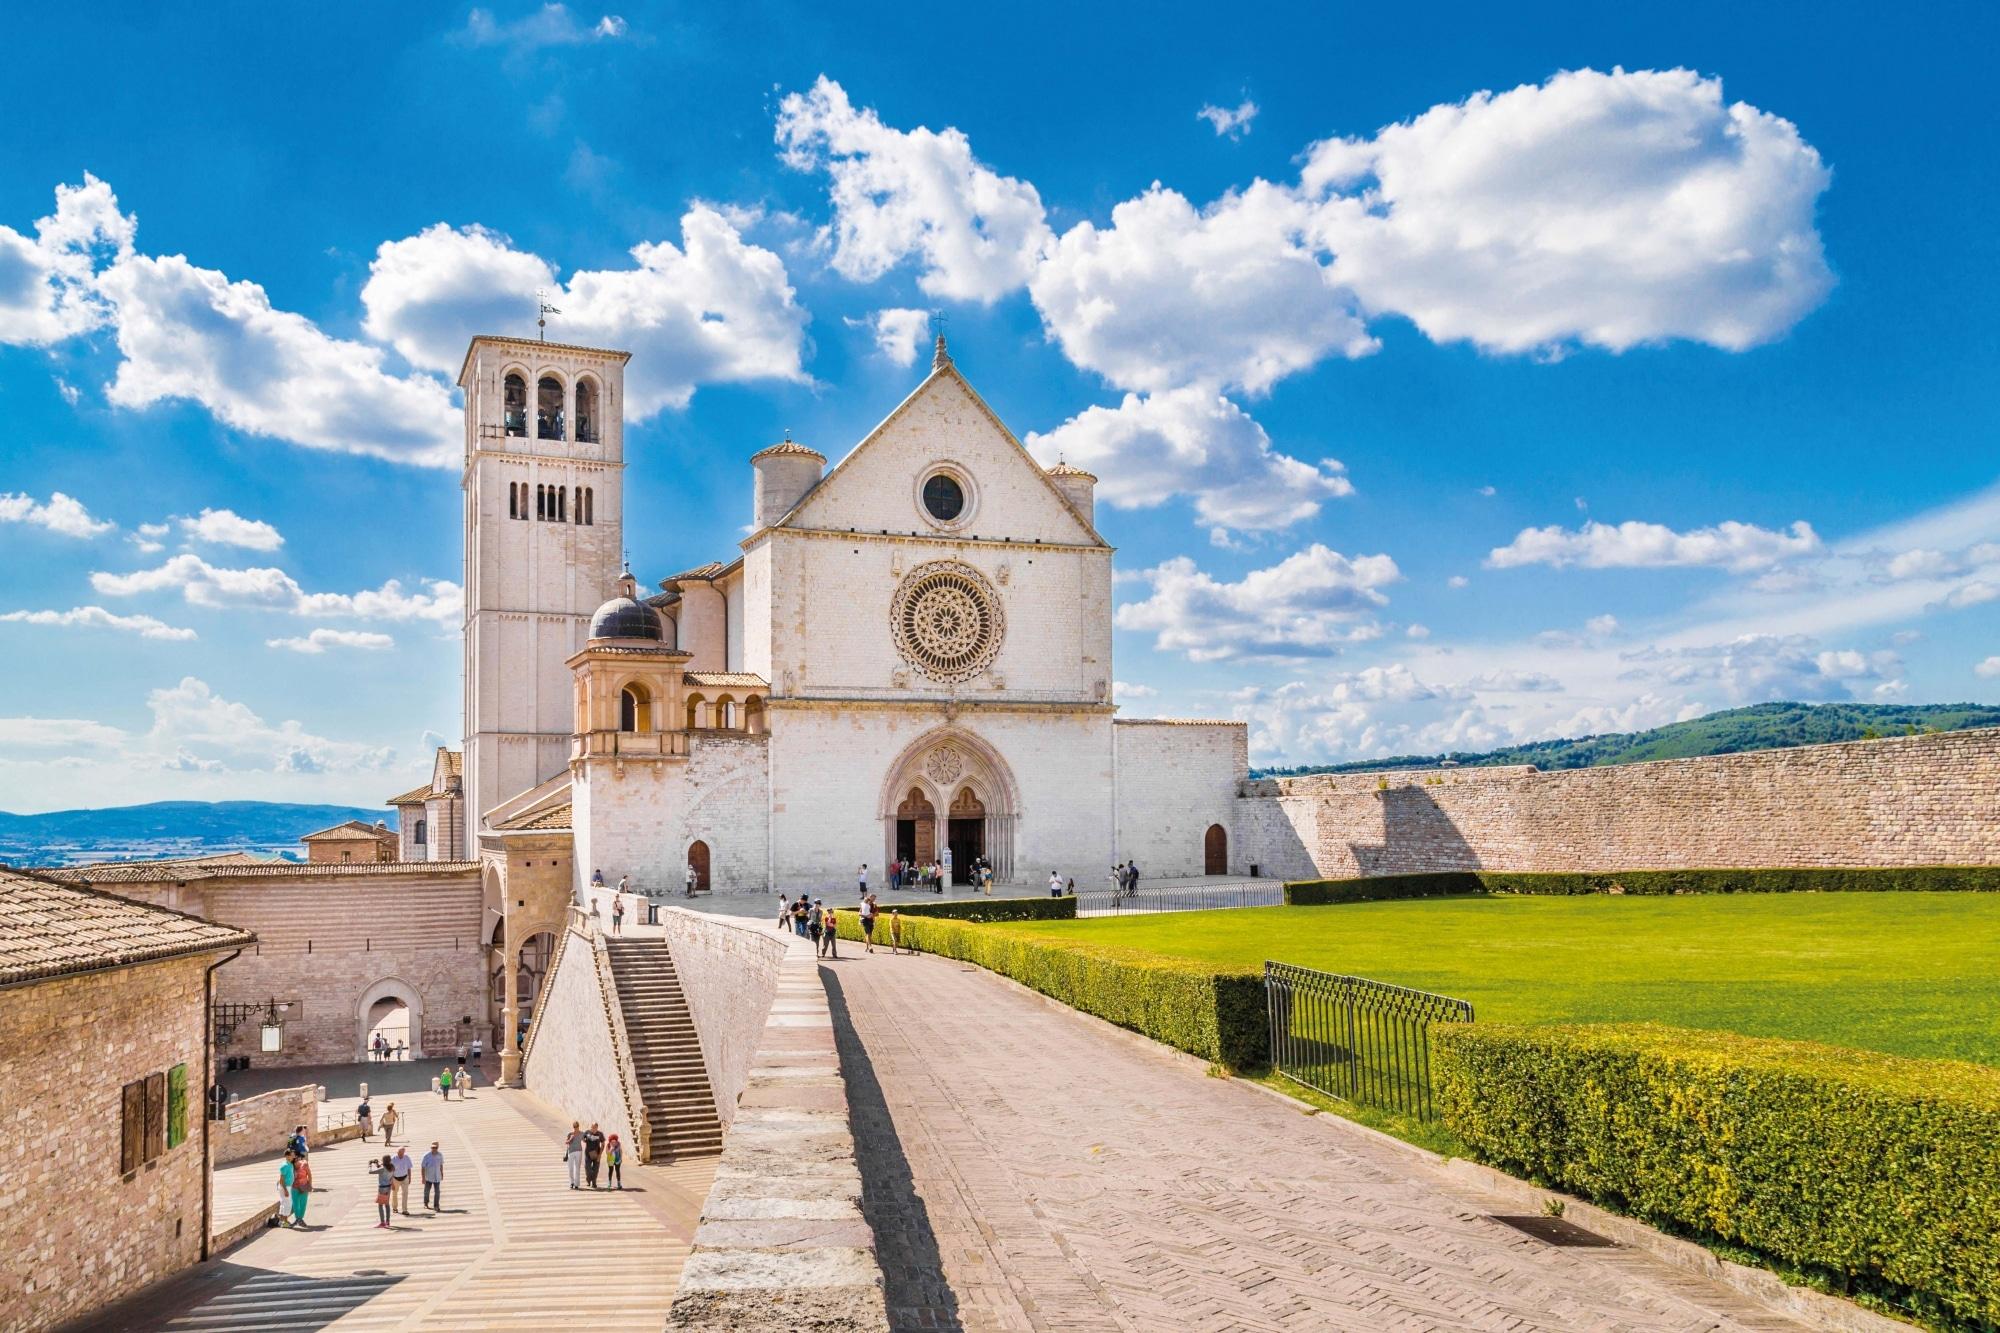 Basilika des Heiligen Franziskus